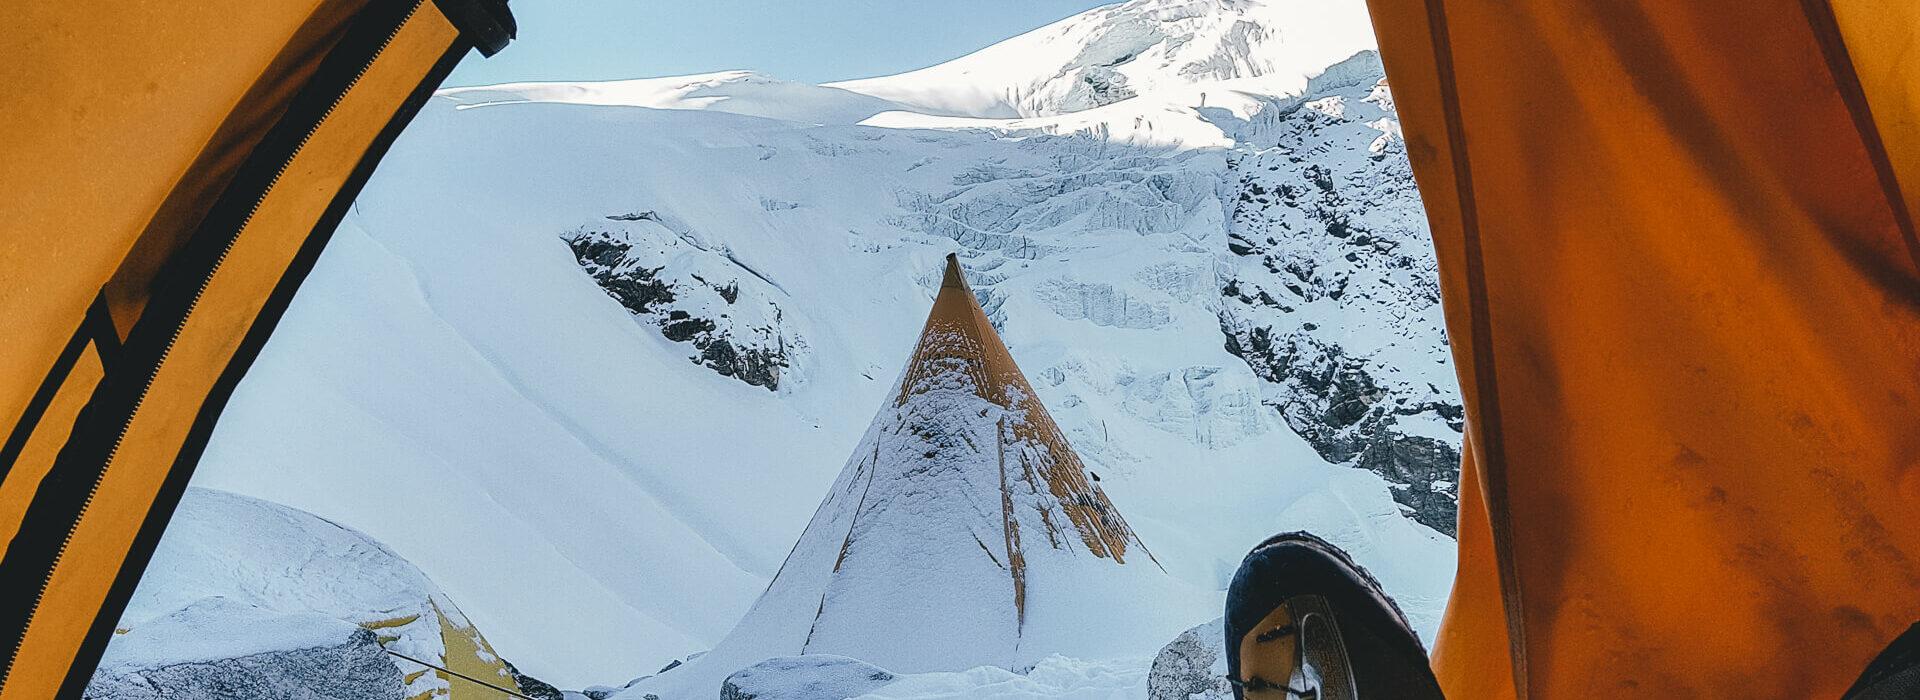 Mera Peak with Earth's Edge